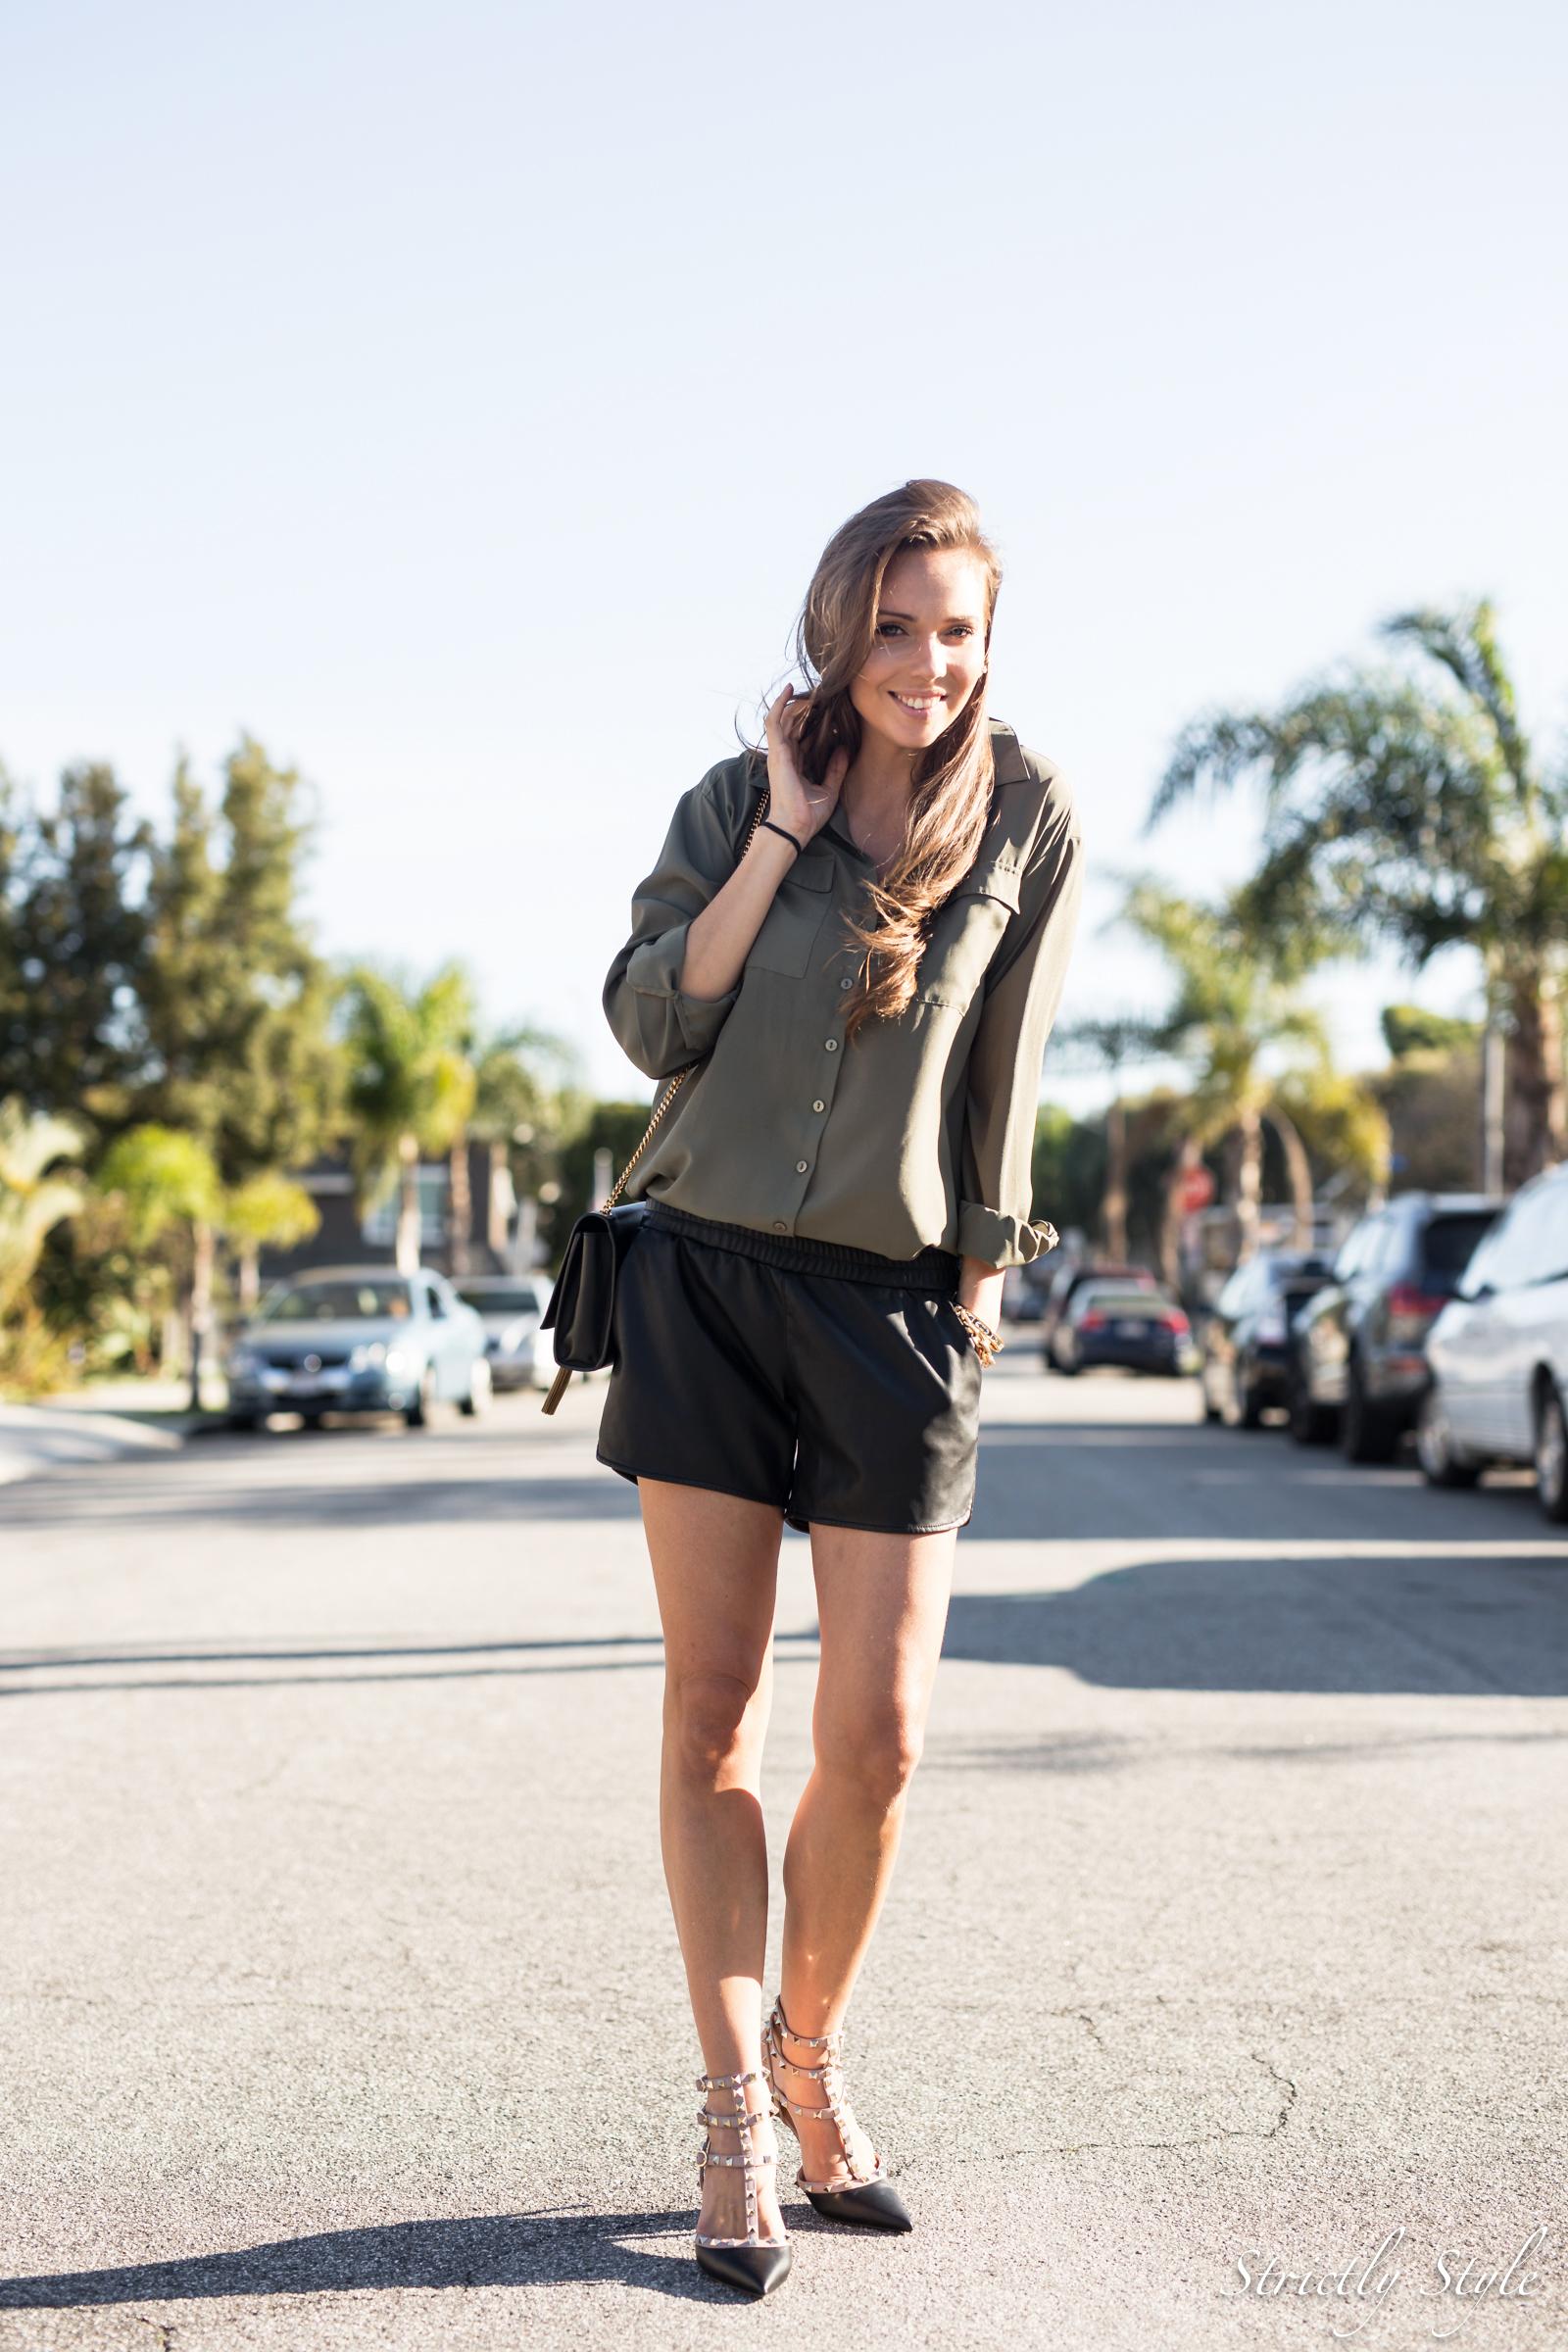 eka asu losissa valnrtino rockstuds black leather shorts-9849